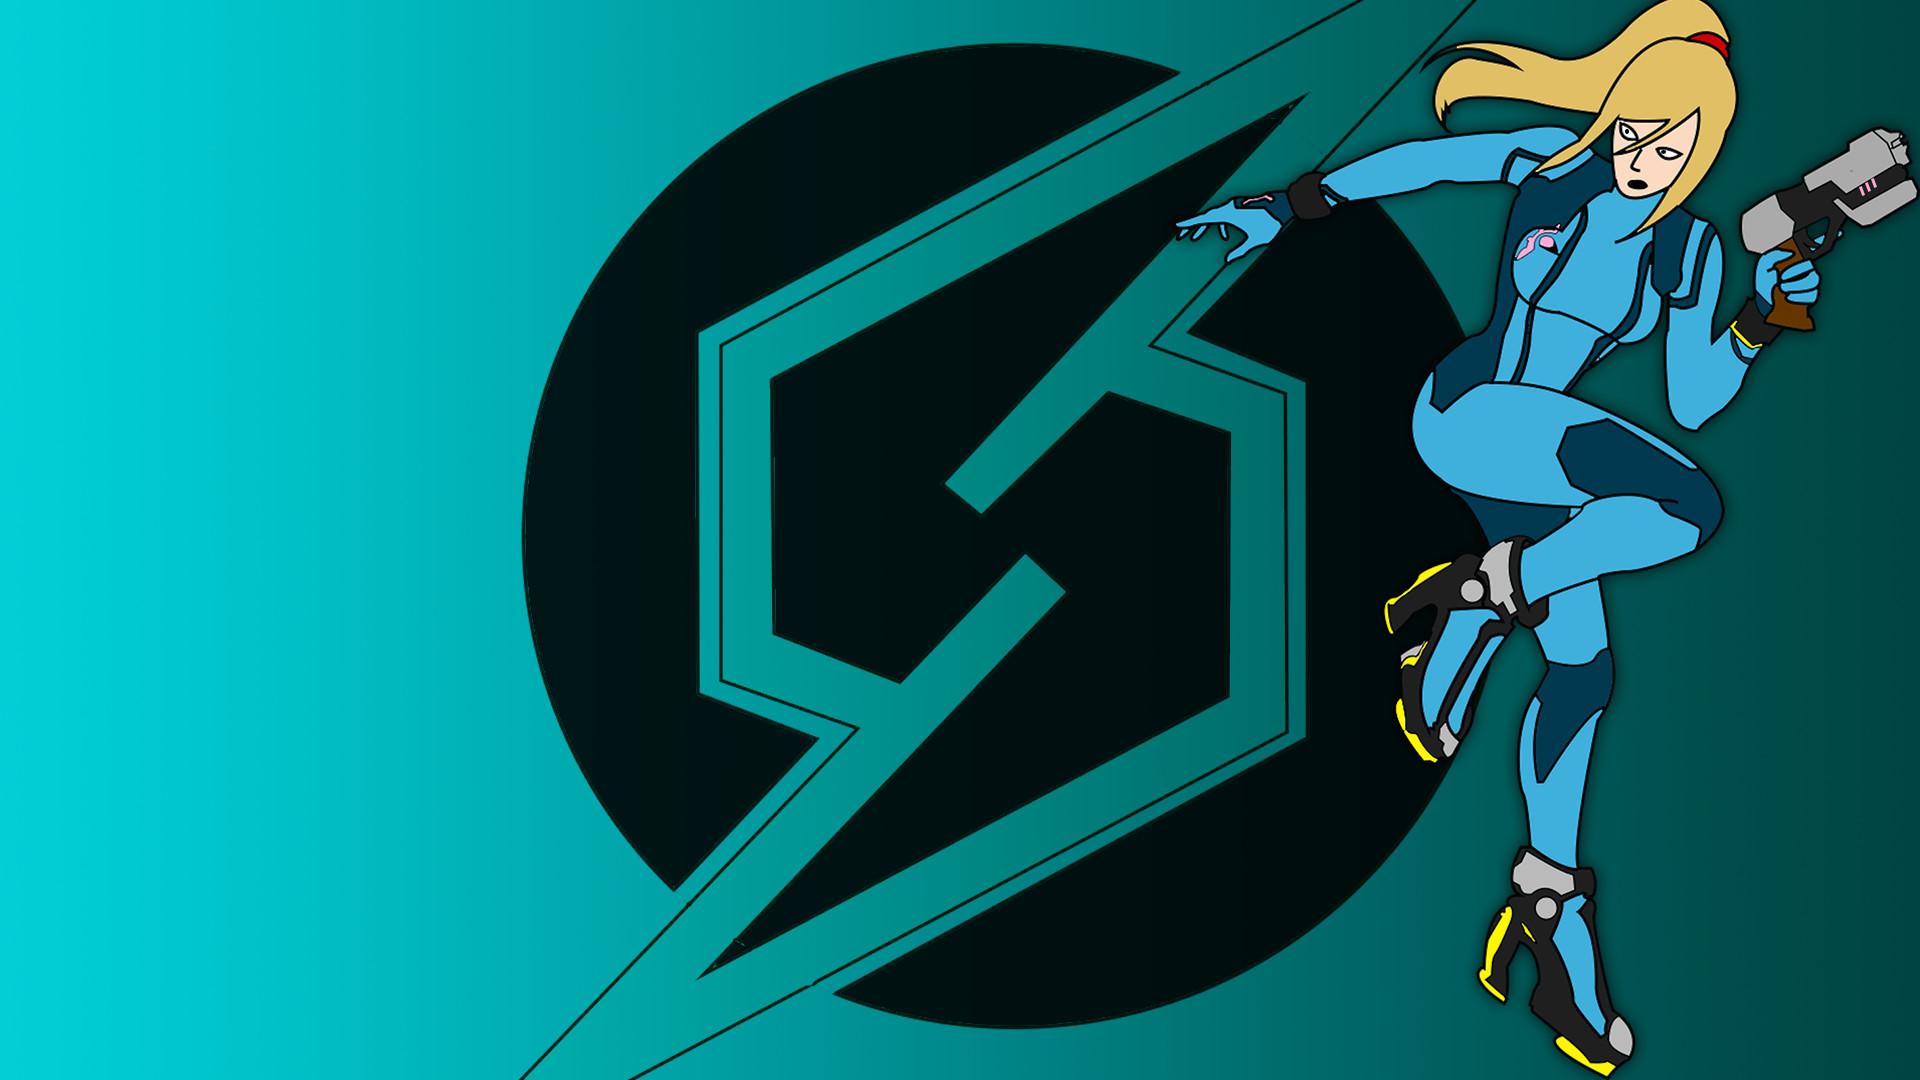 … Zero Suit Samus by Laser-Art